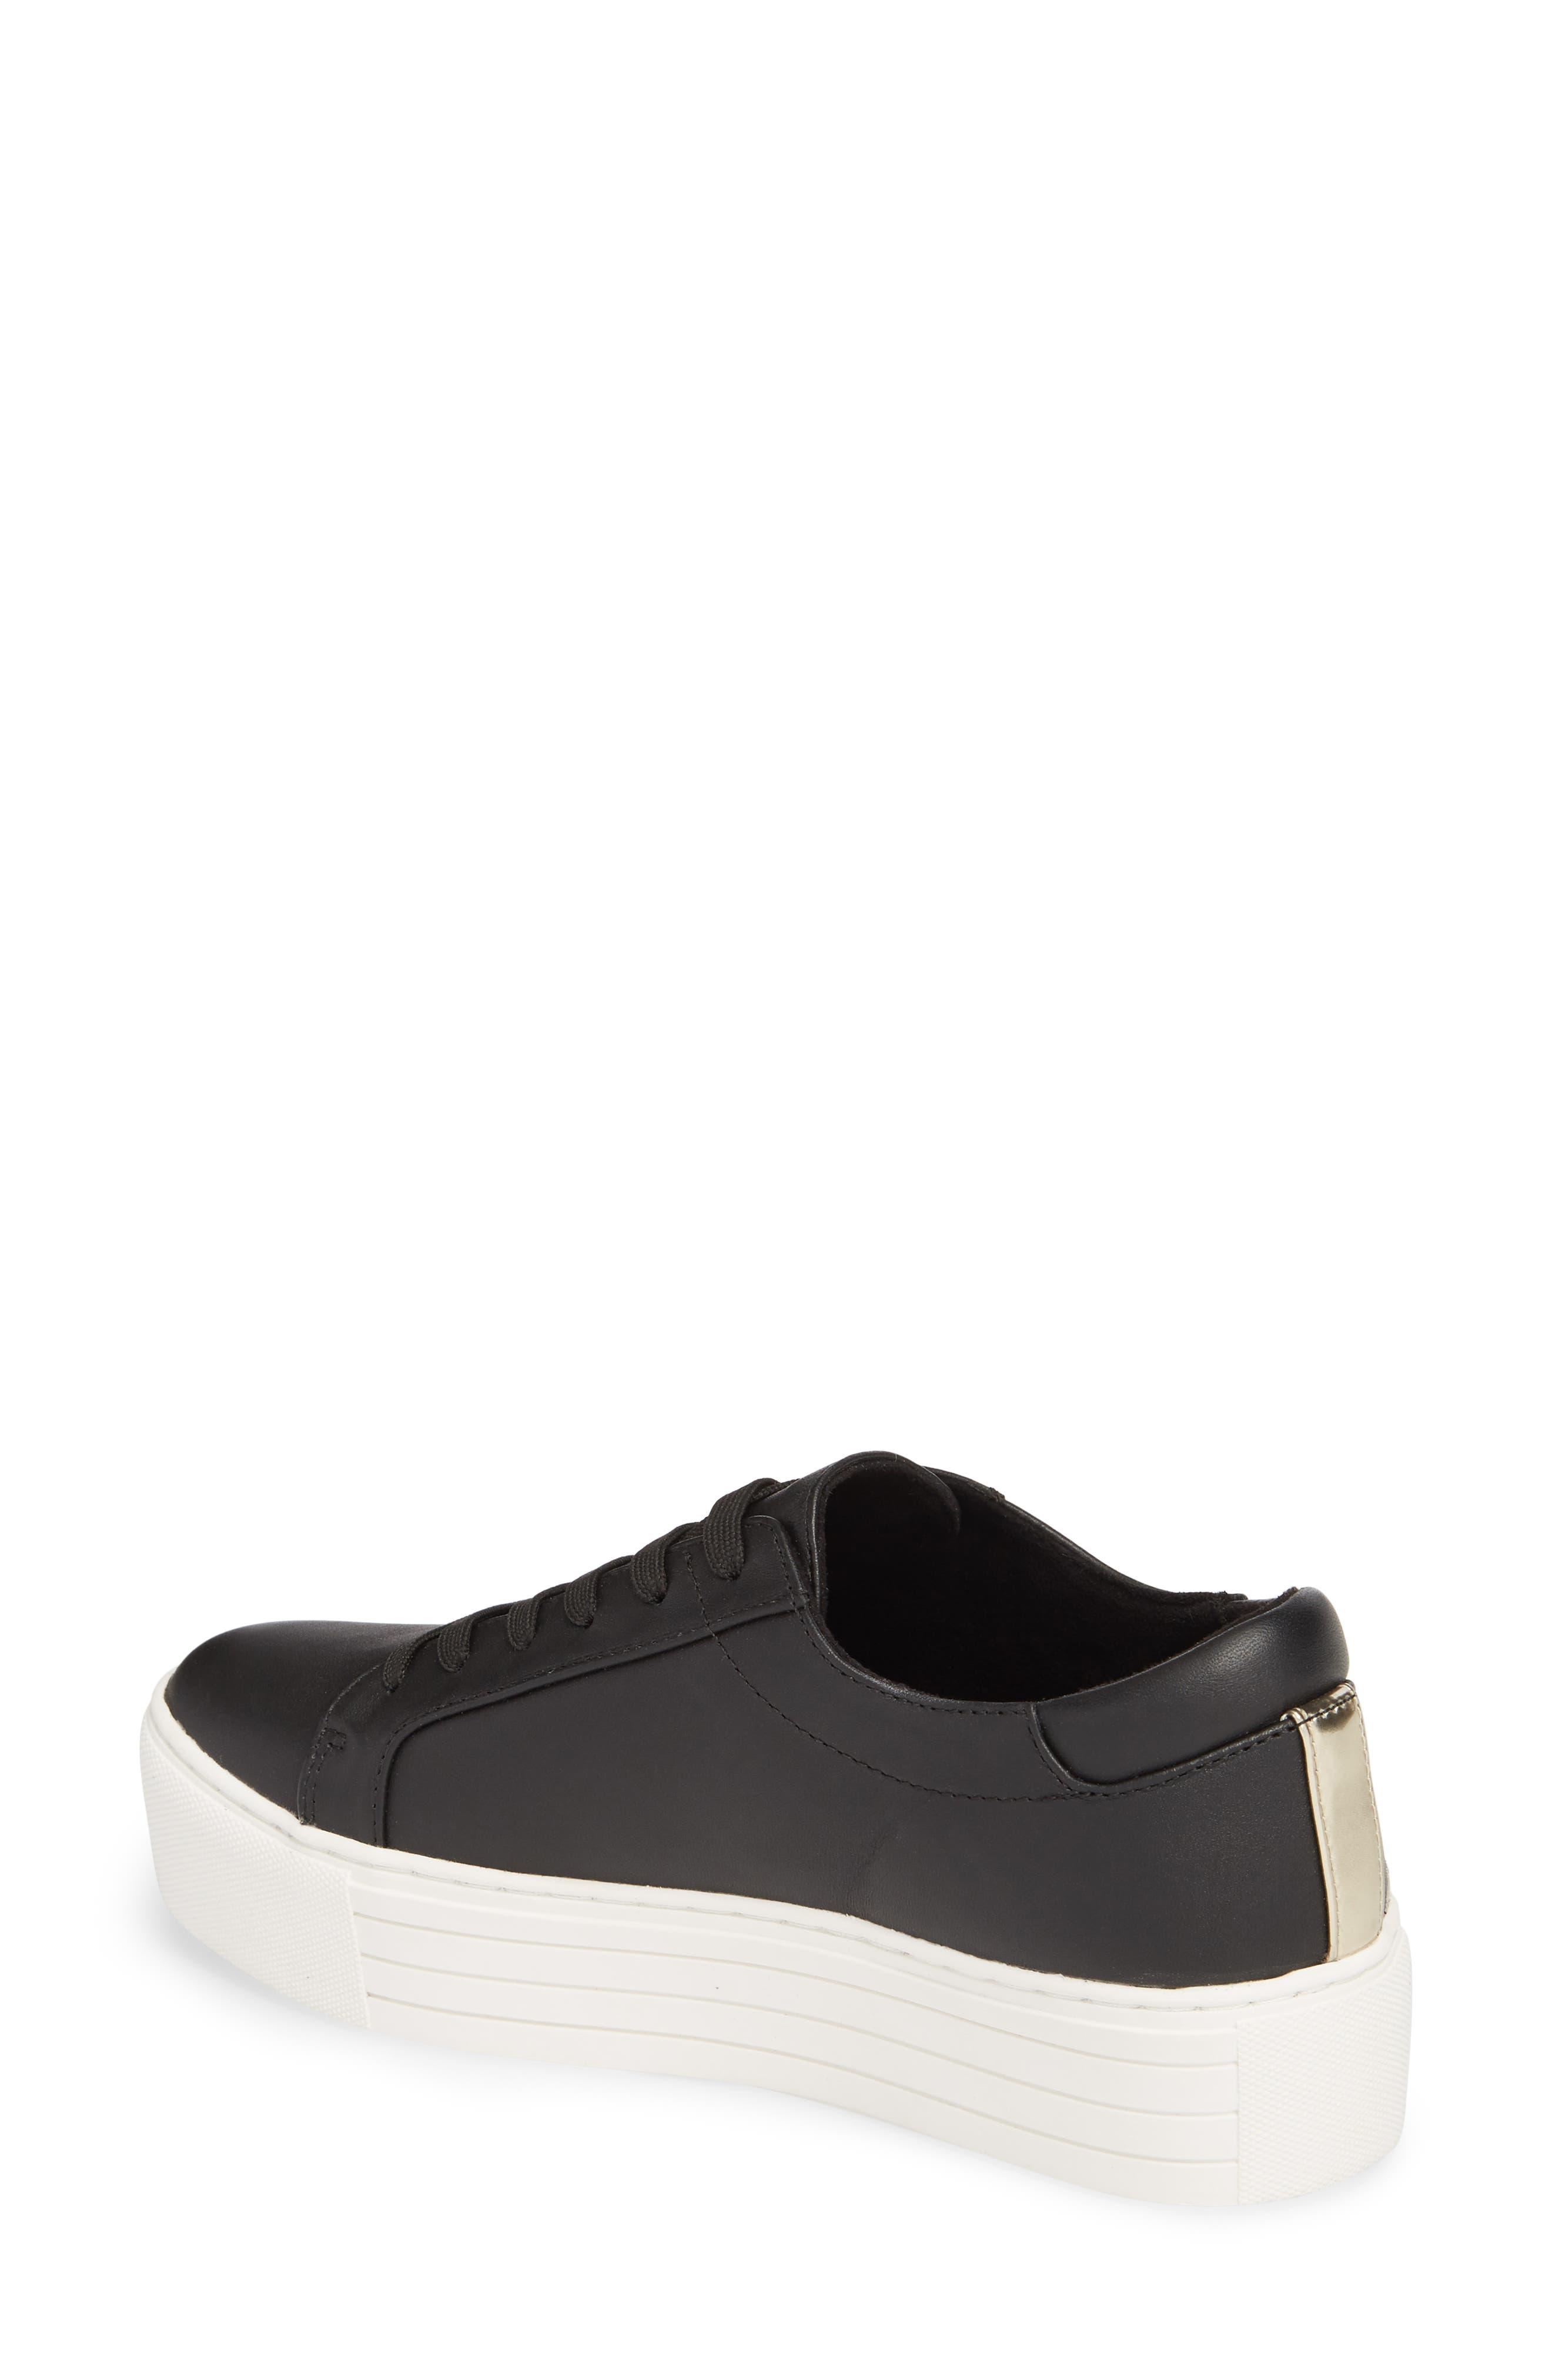 Abbey Platform Sneaker,                             Alternate thumbnail 2, color,                             002